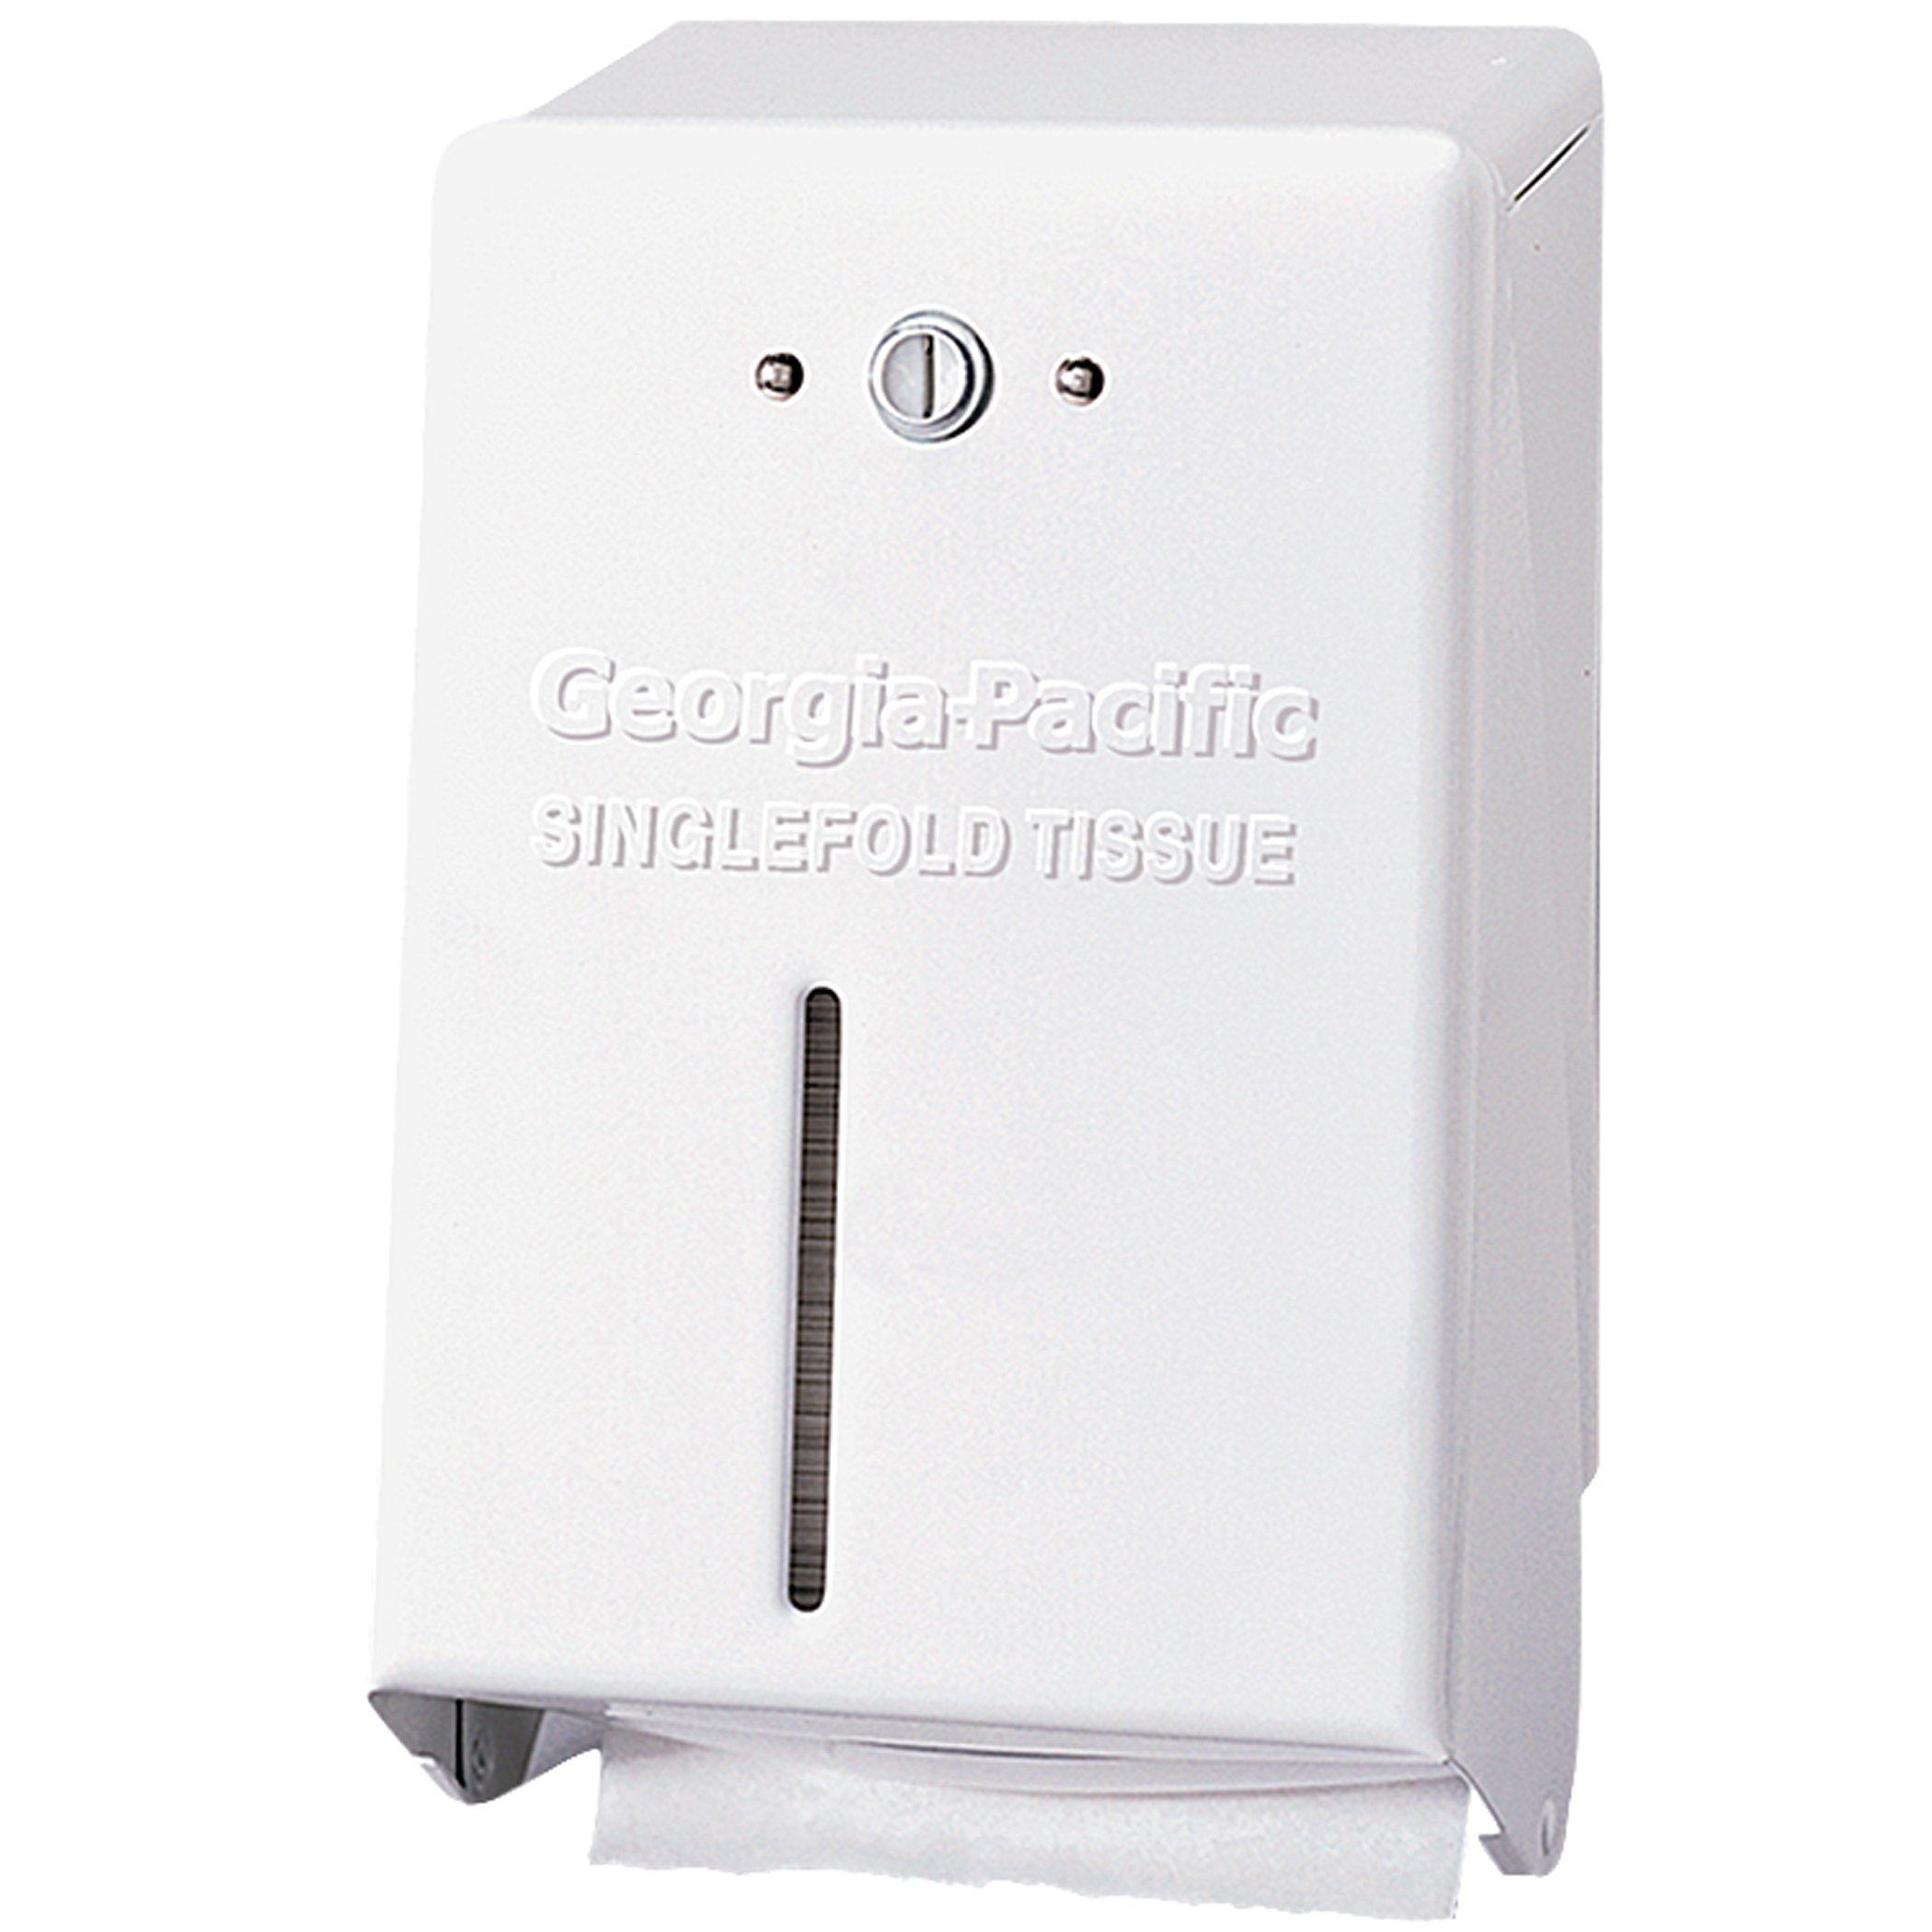 Georgia-Pacific 58701 White Singlefold Interfolded Tissue Dispenser (WxDxH) 5.000'' x 3.125'' x 8.250''